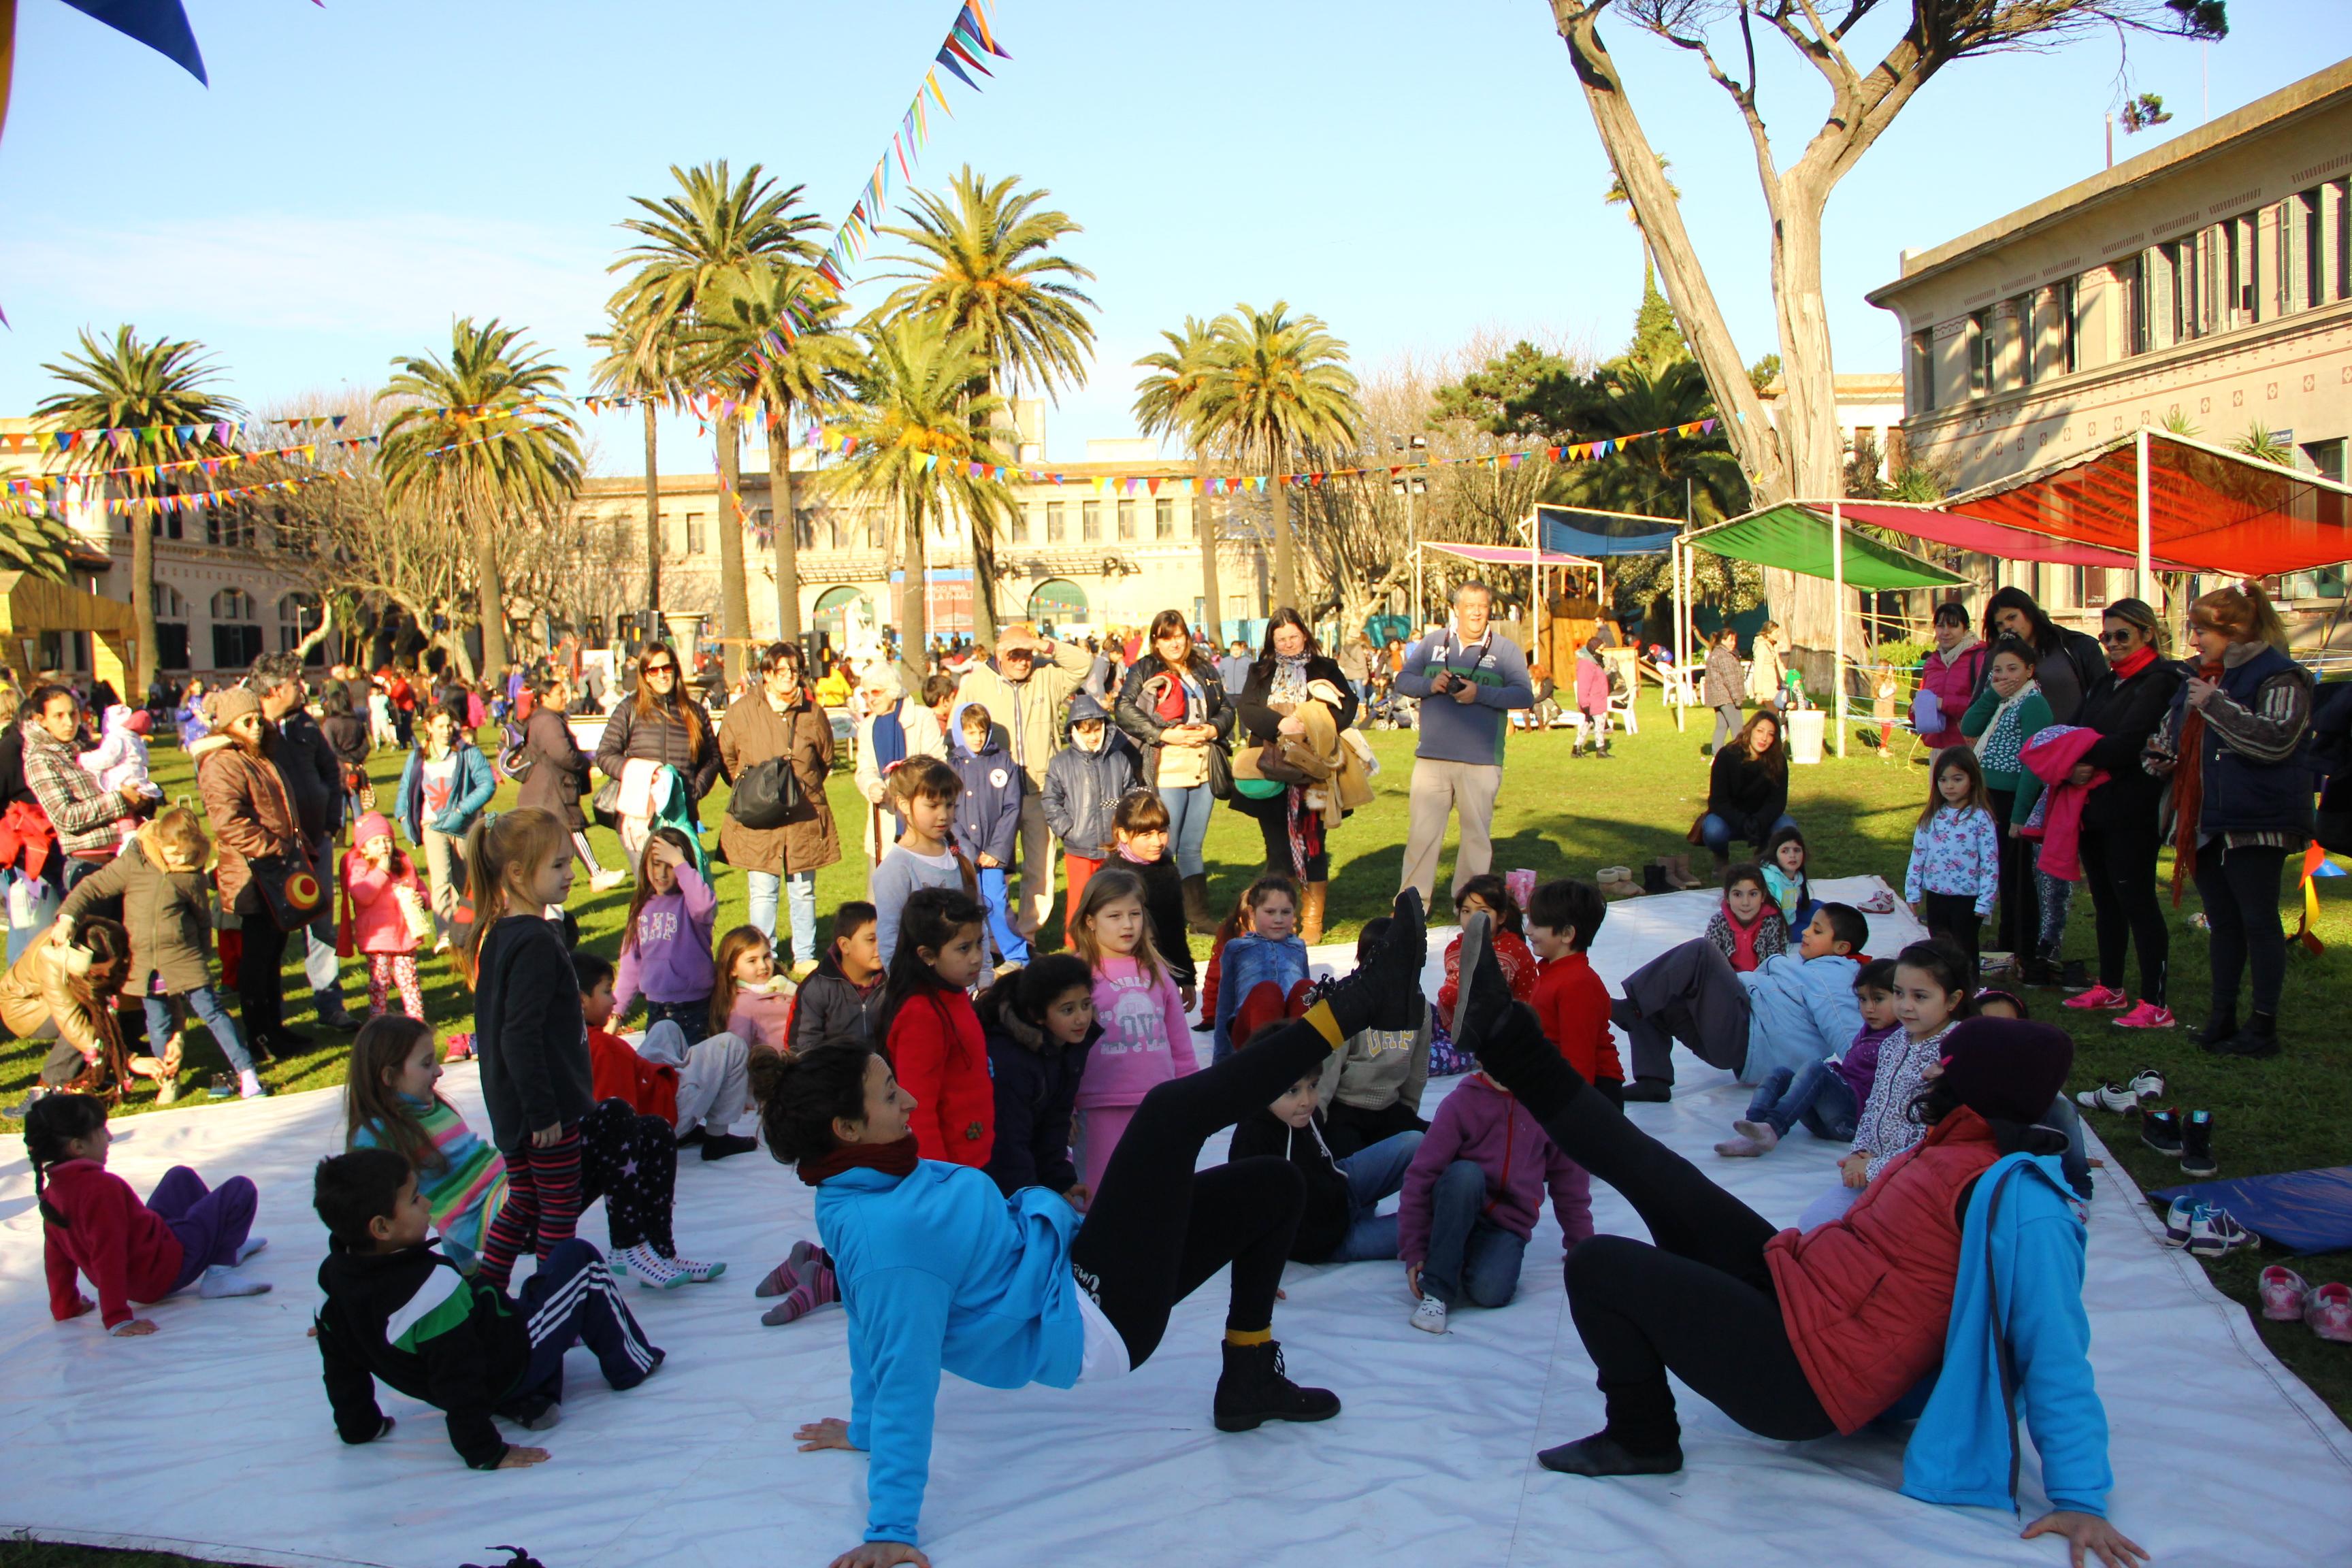 Baile al aire libre